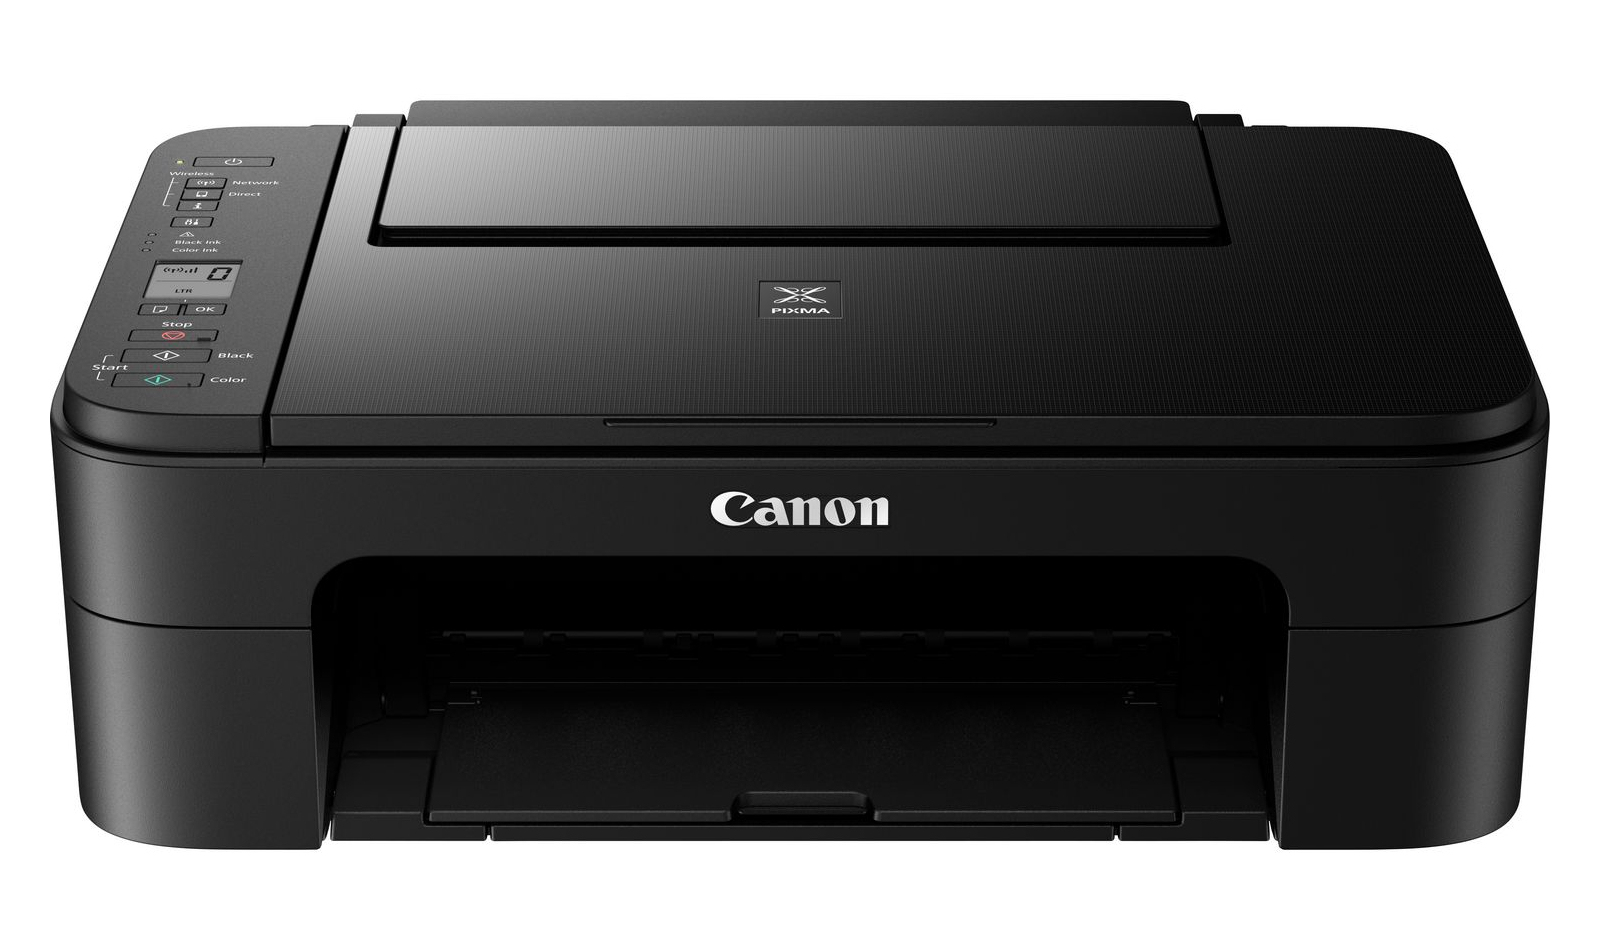 Canon - Ts3150 Bk Wifi